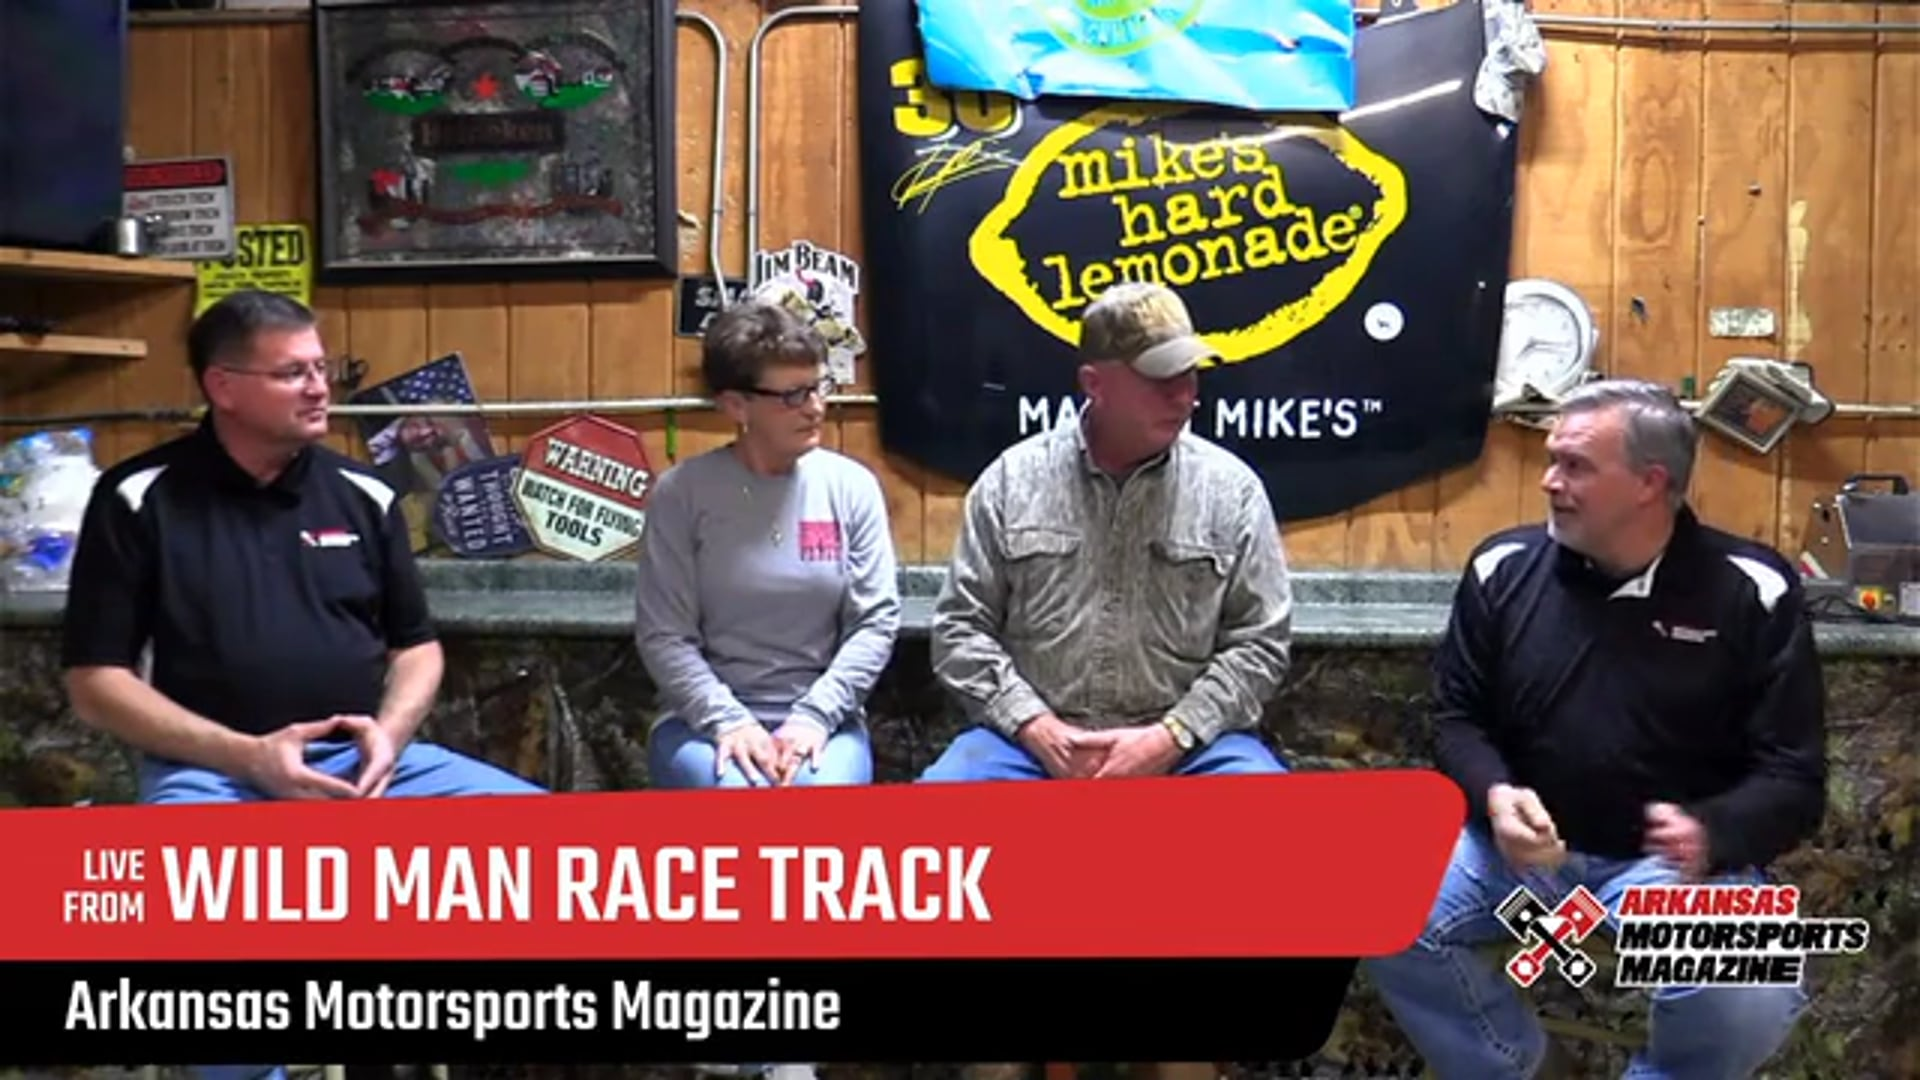 TUESDAY NIGHT TUNE UP - S1:E9 - Wild Man Race Track in Pine. Bluff Arkansas